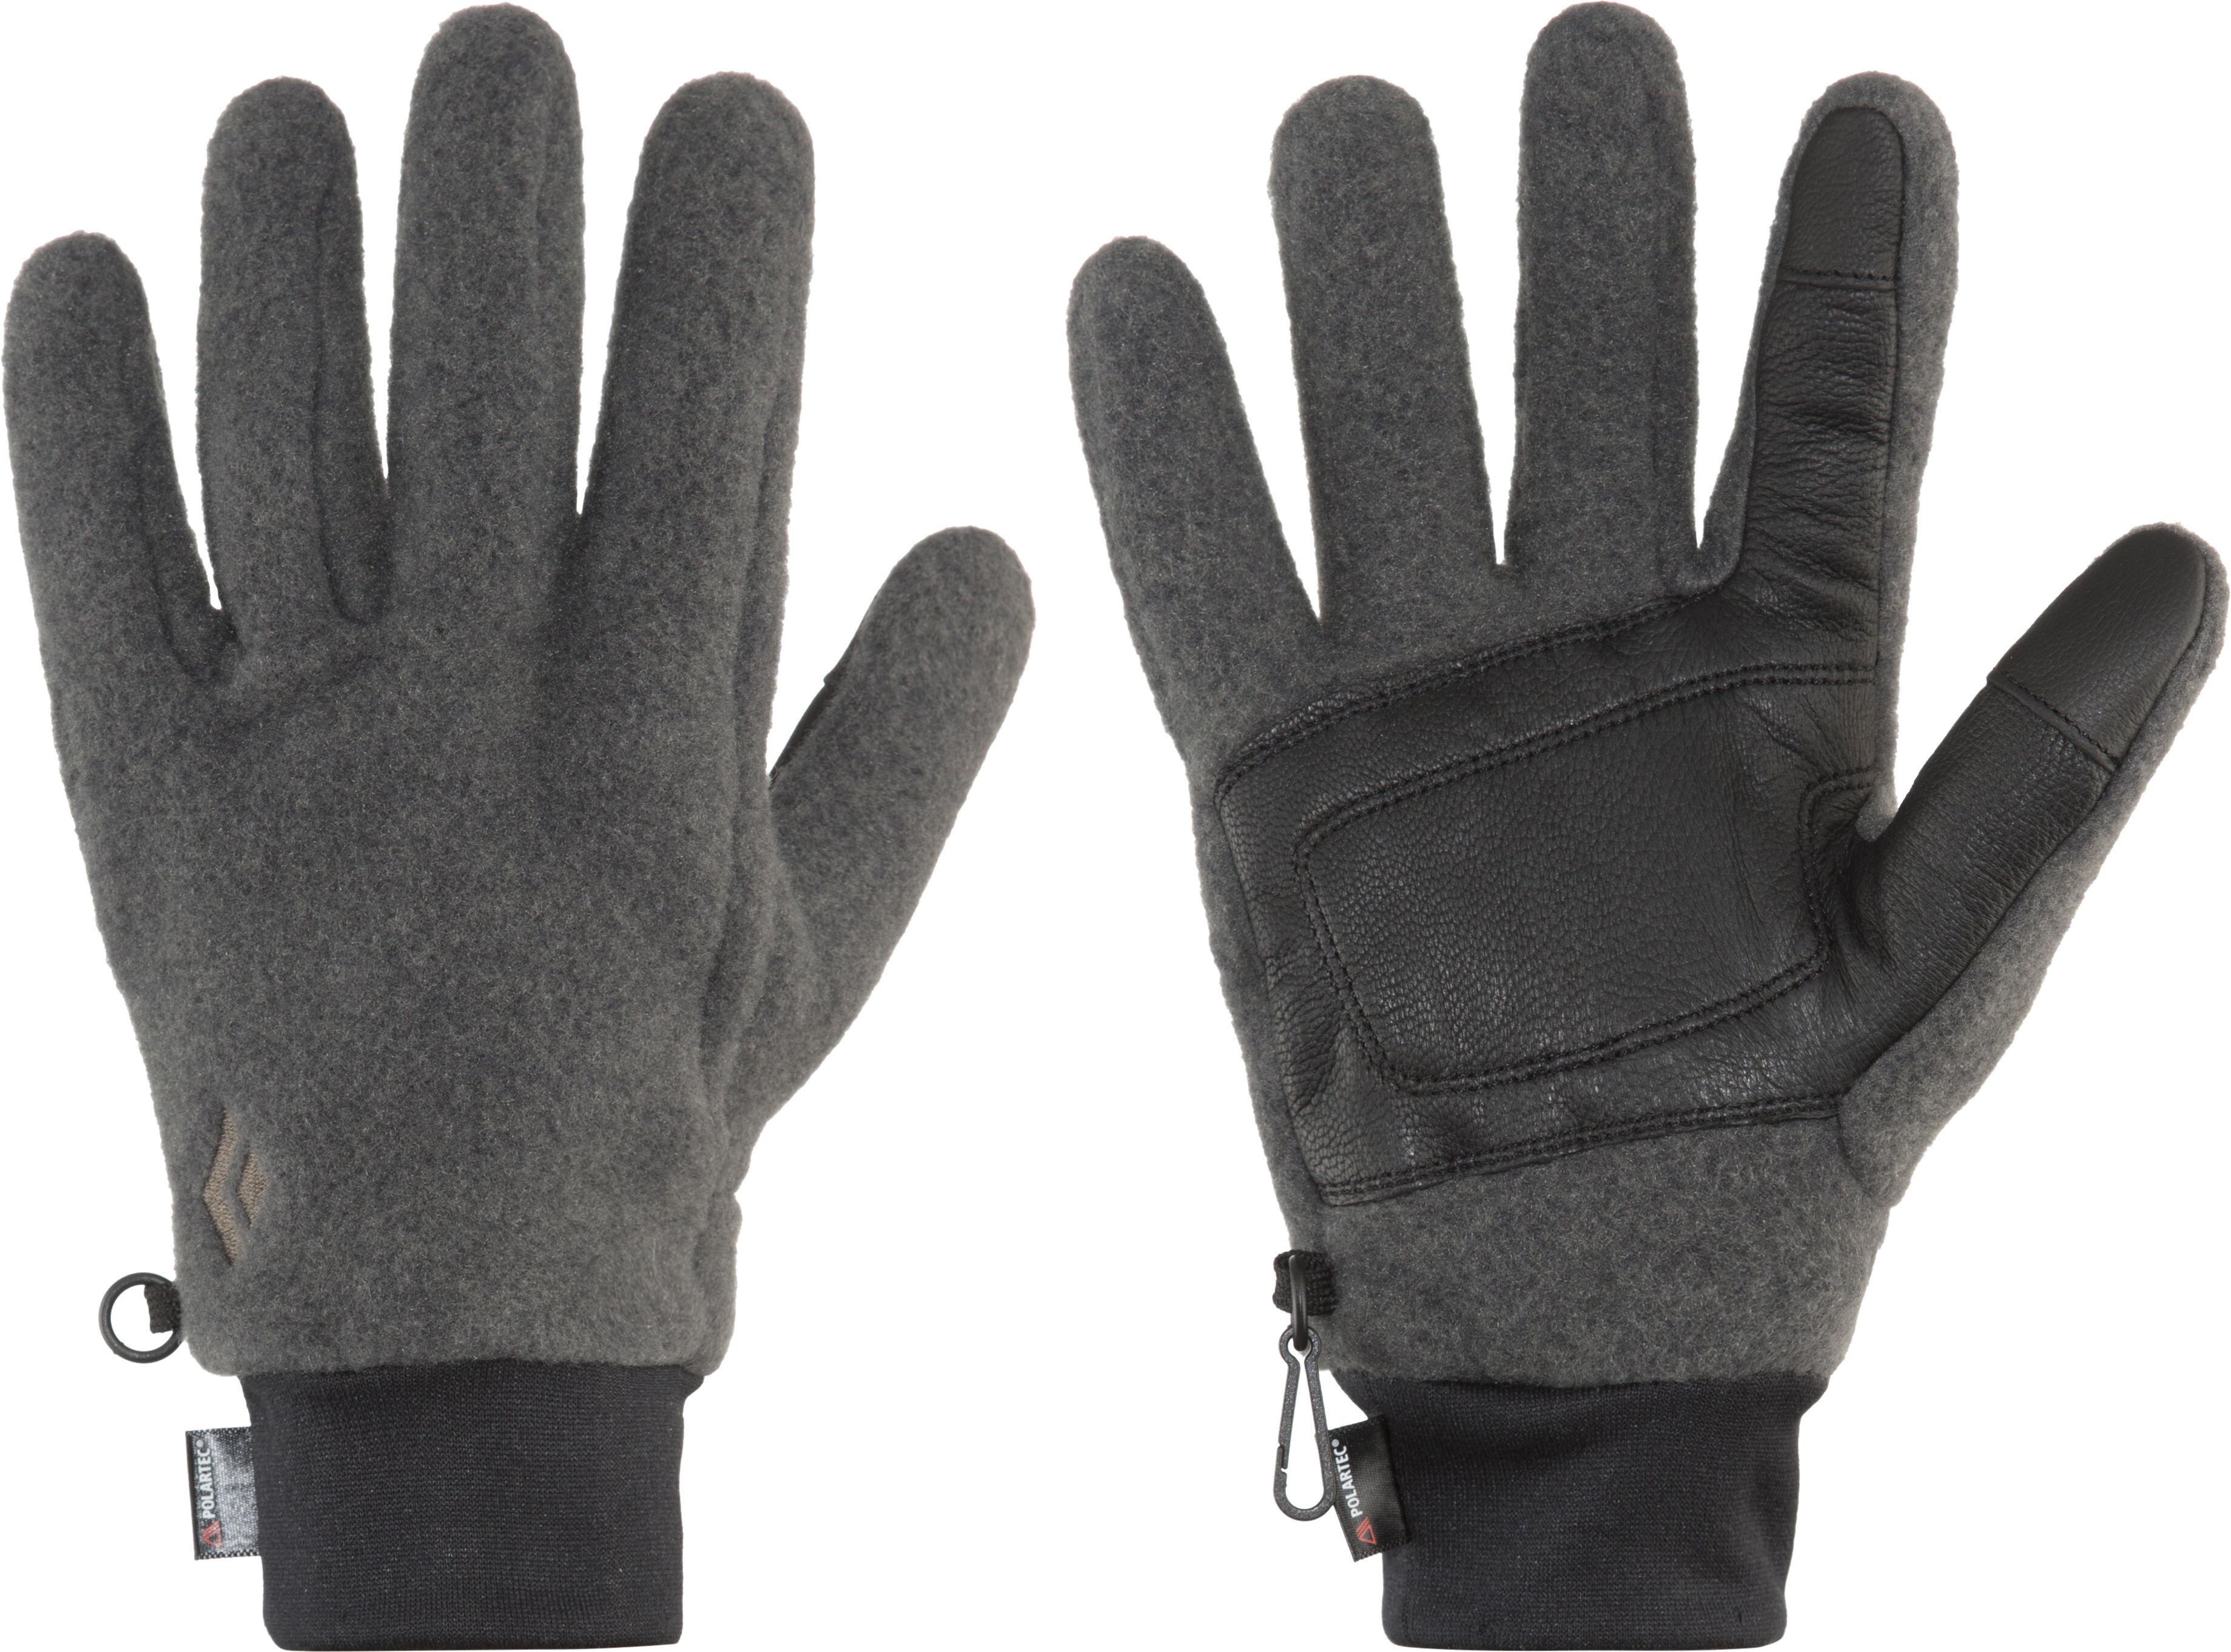 Black Diamond Heavyweight Wooltech Gloves grey black at Addnature.co.uk cd189f4fb05